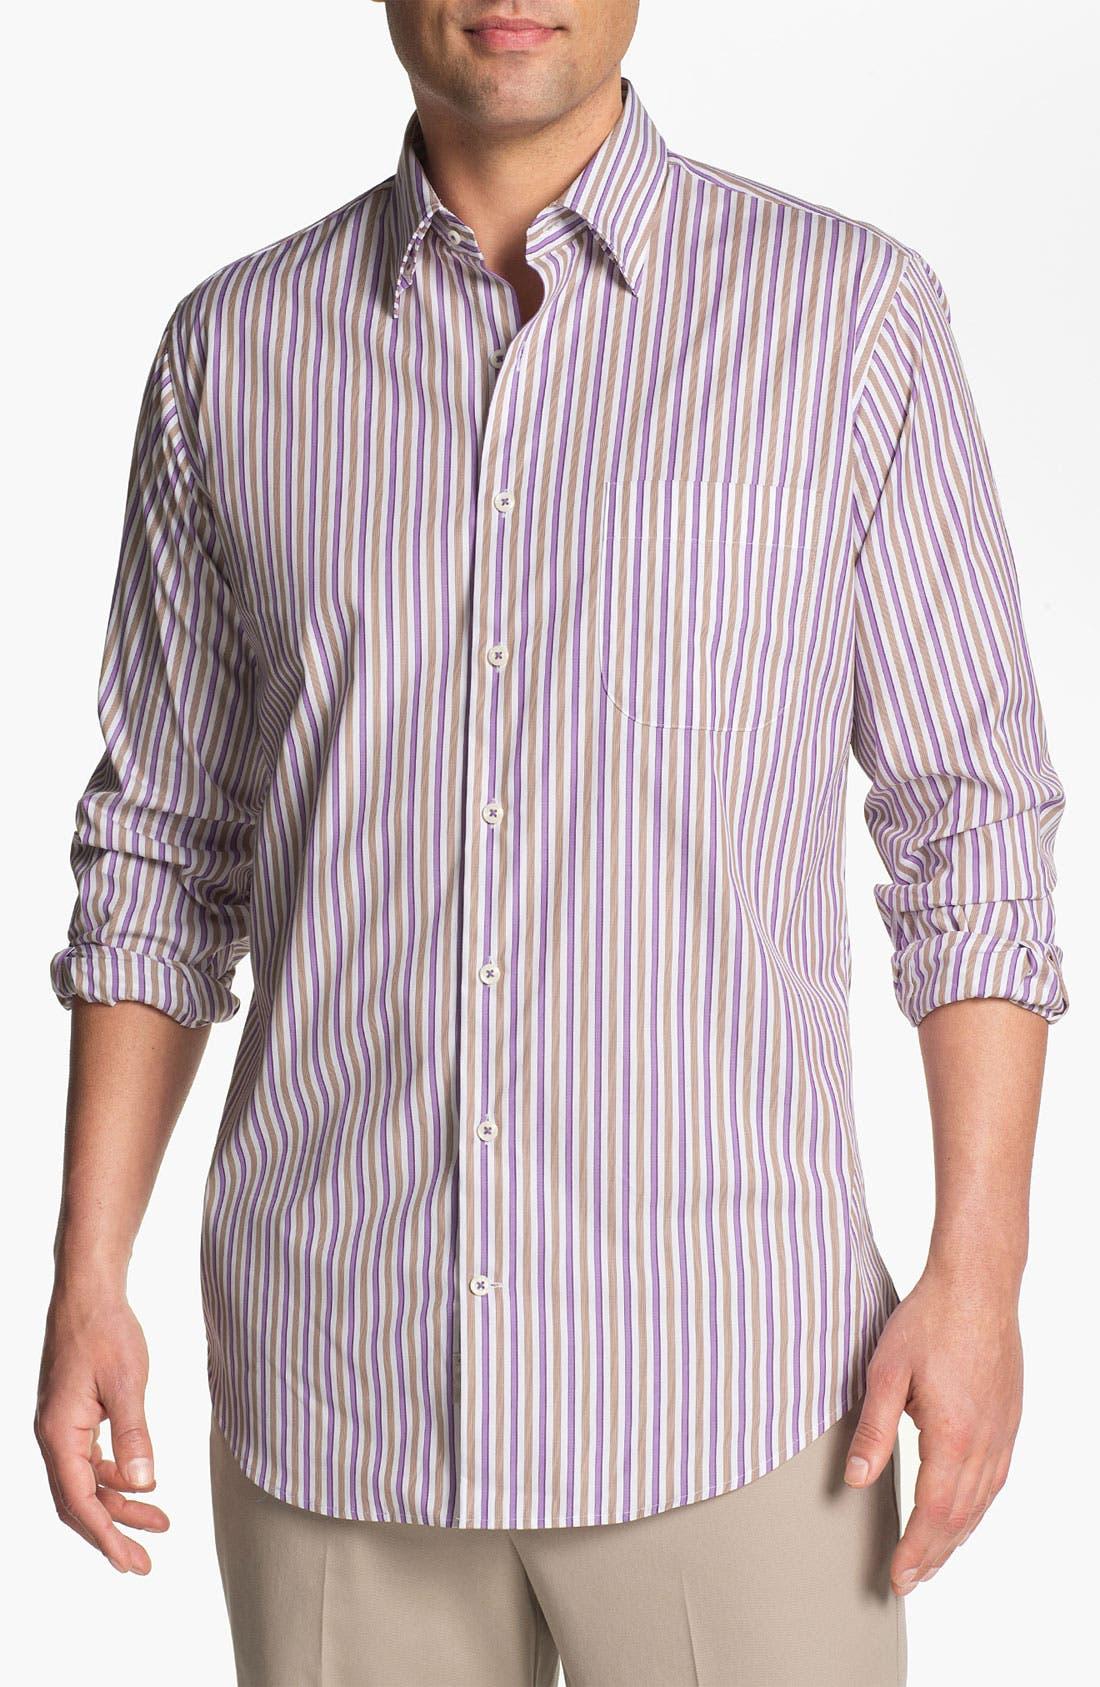 Alternate Image 1 Selected - Peter Millar 'Munich' Regular Fit Stripe Sport Shirt